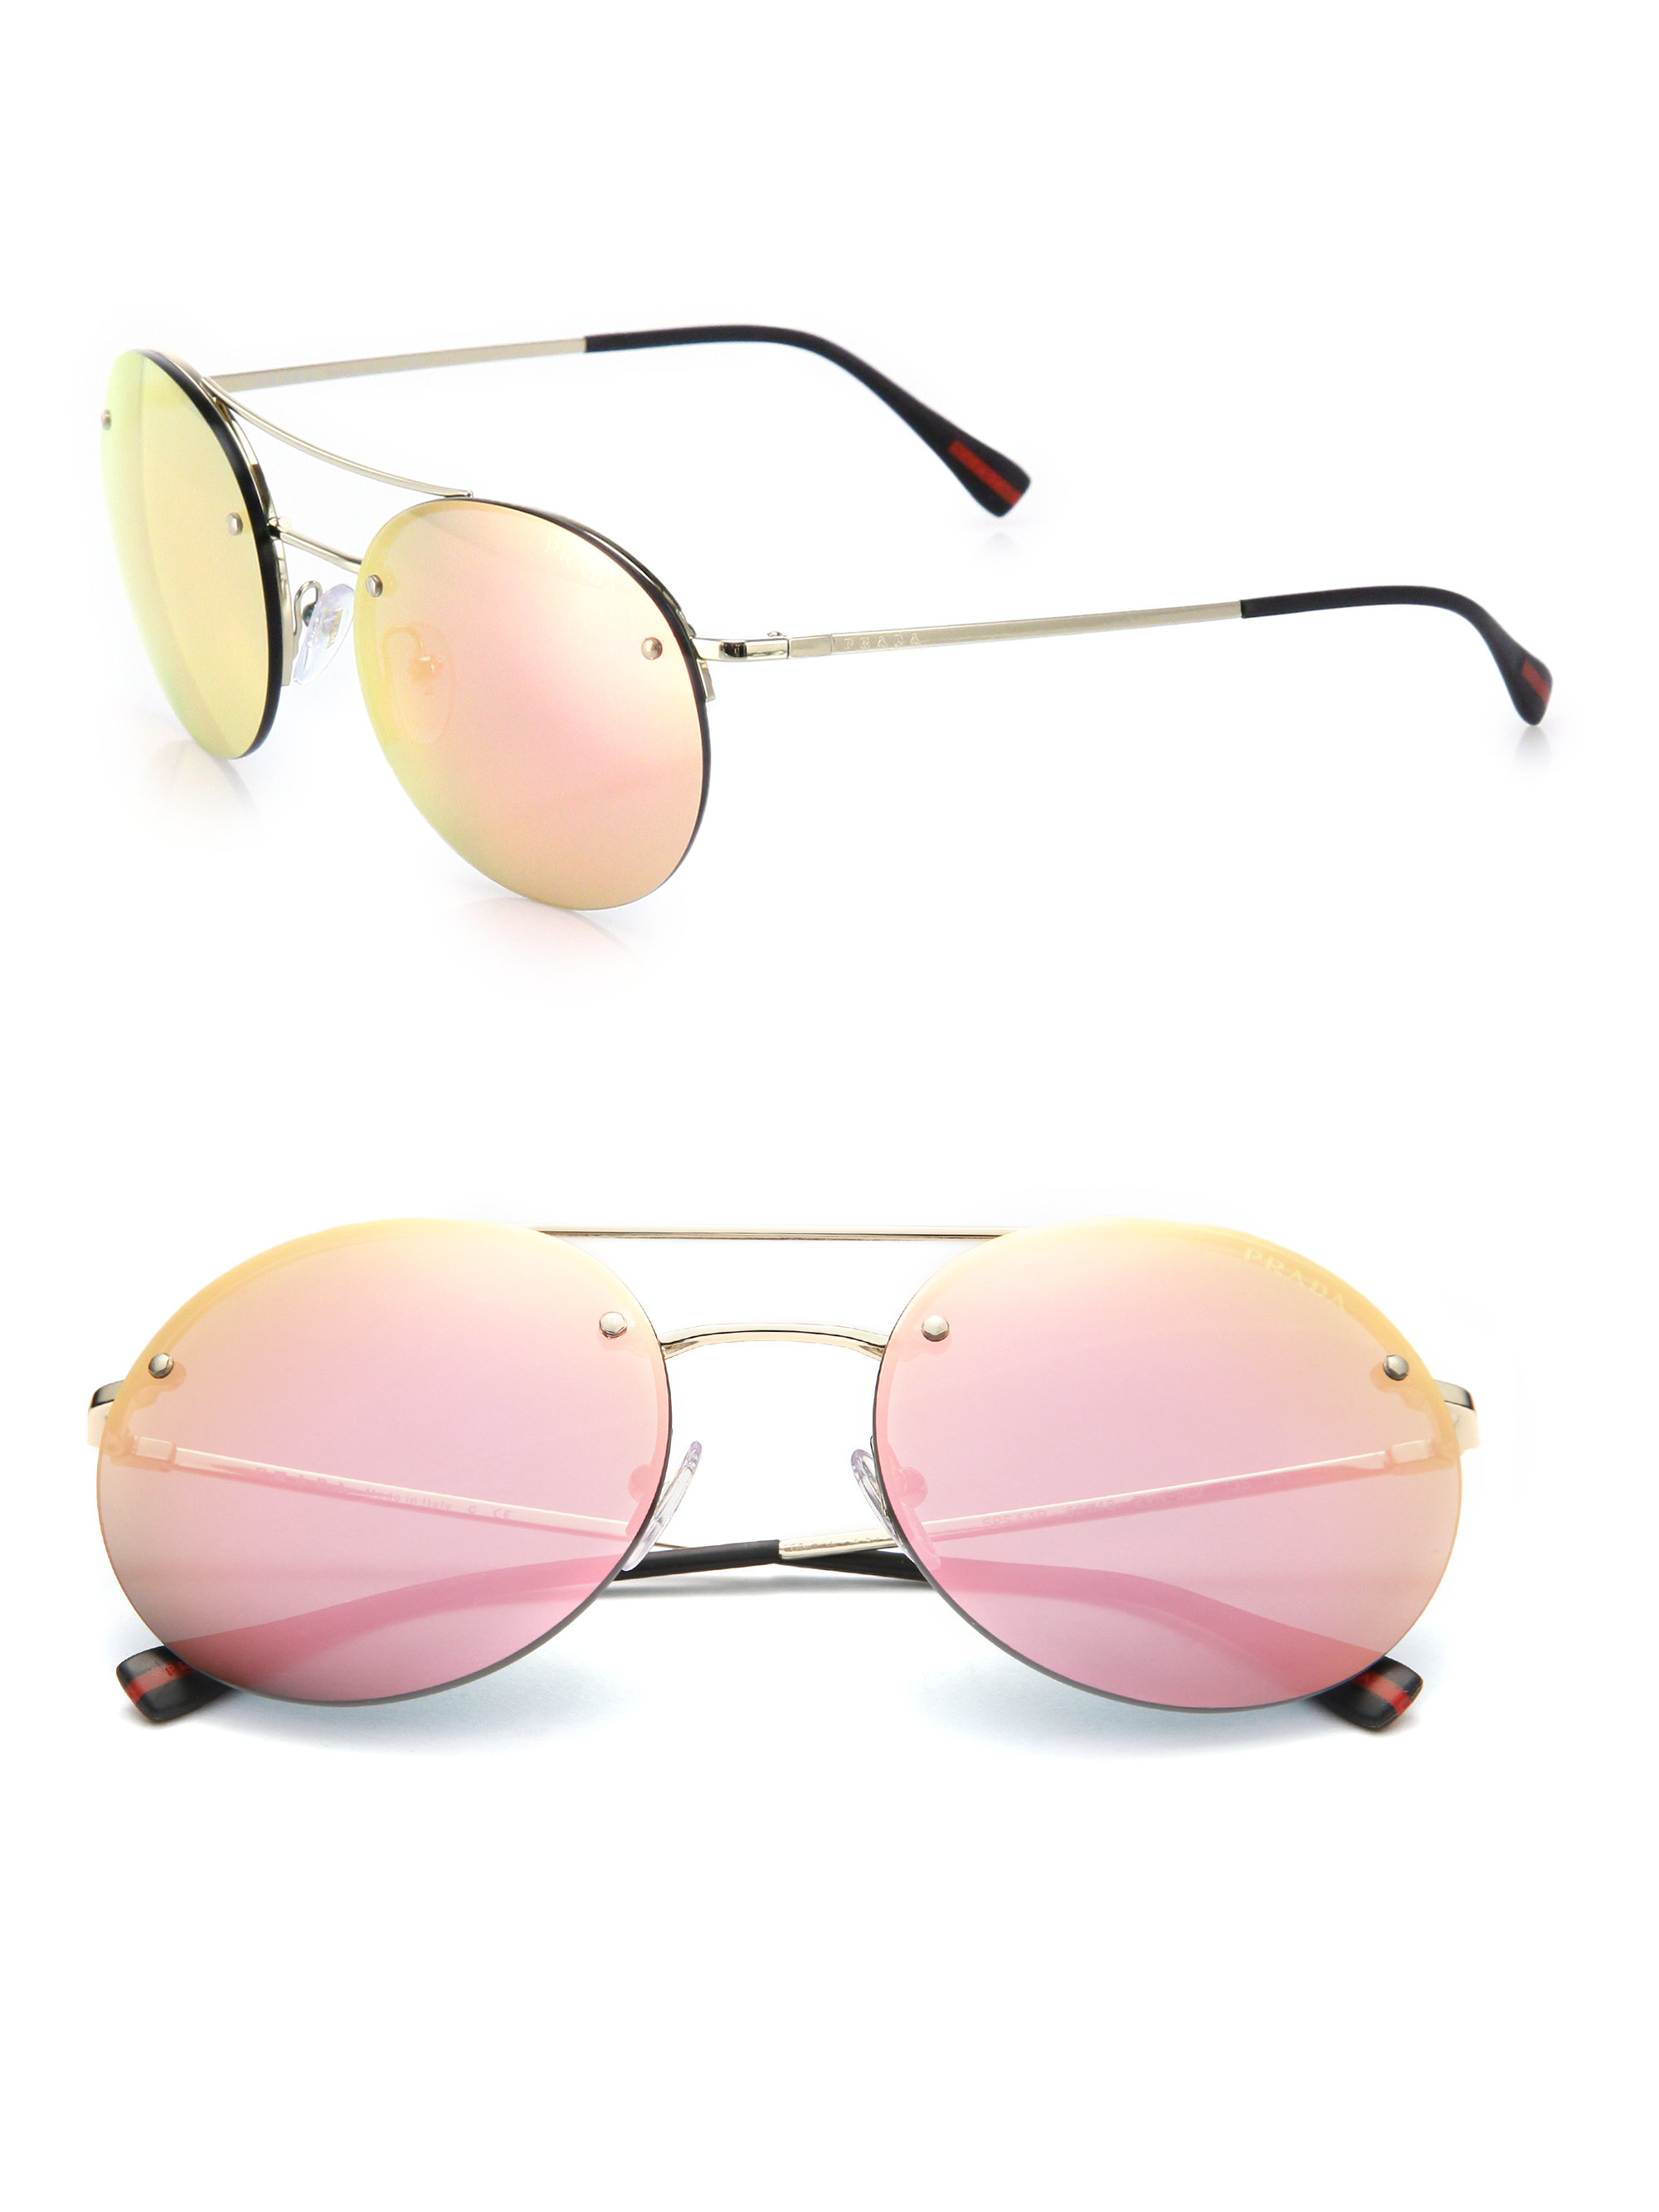 f69b9c71a ... promo code for lyst prada 56mm round metal sunglasses in pink for men  669cd dfa2c